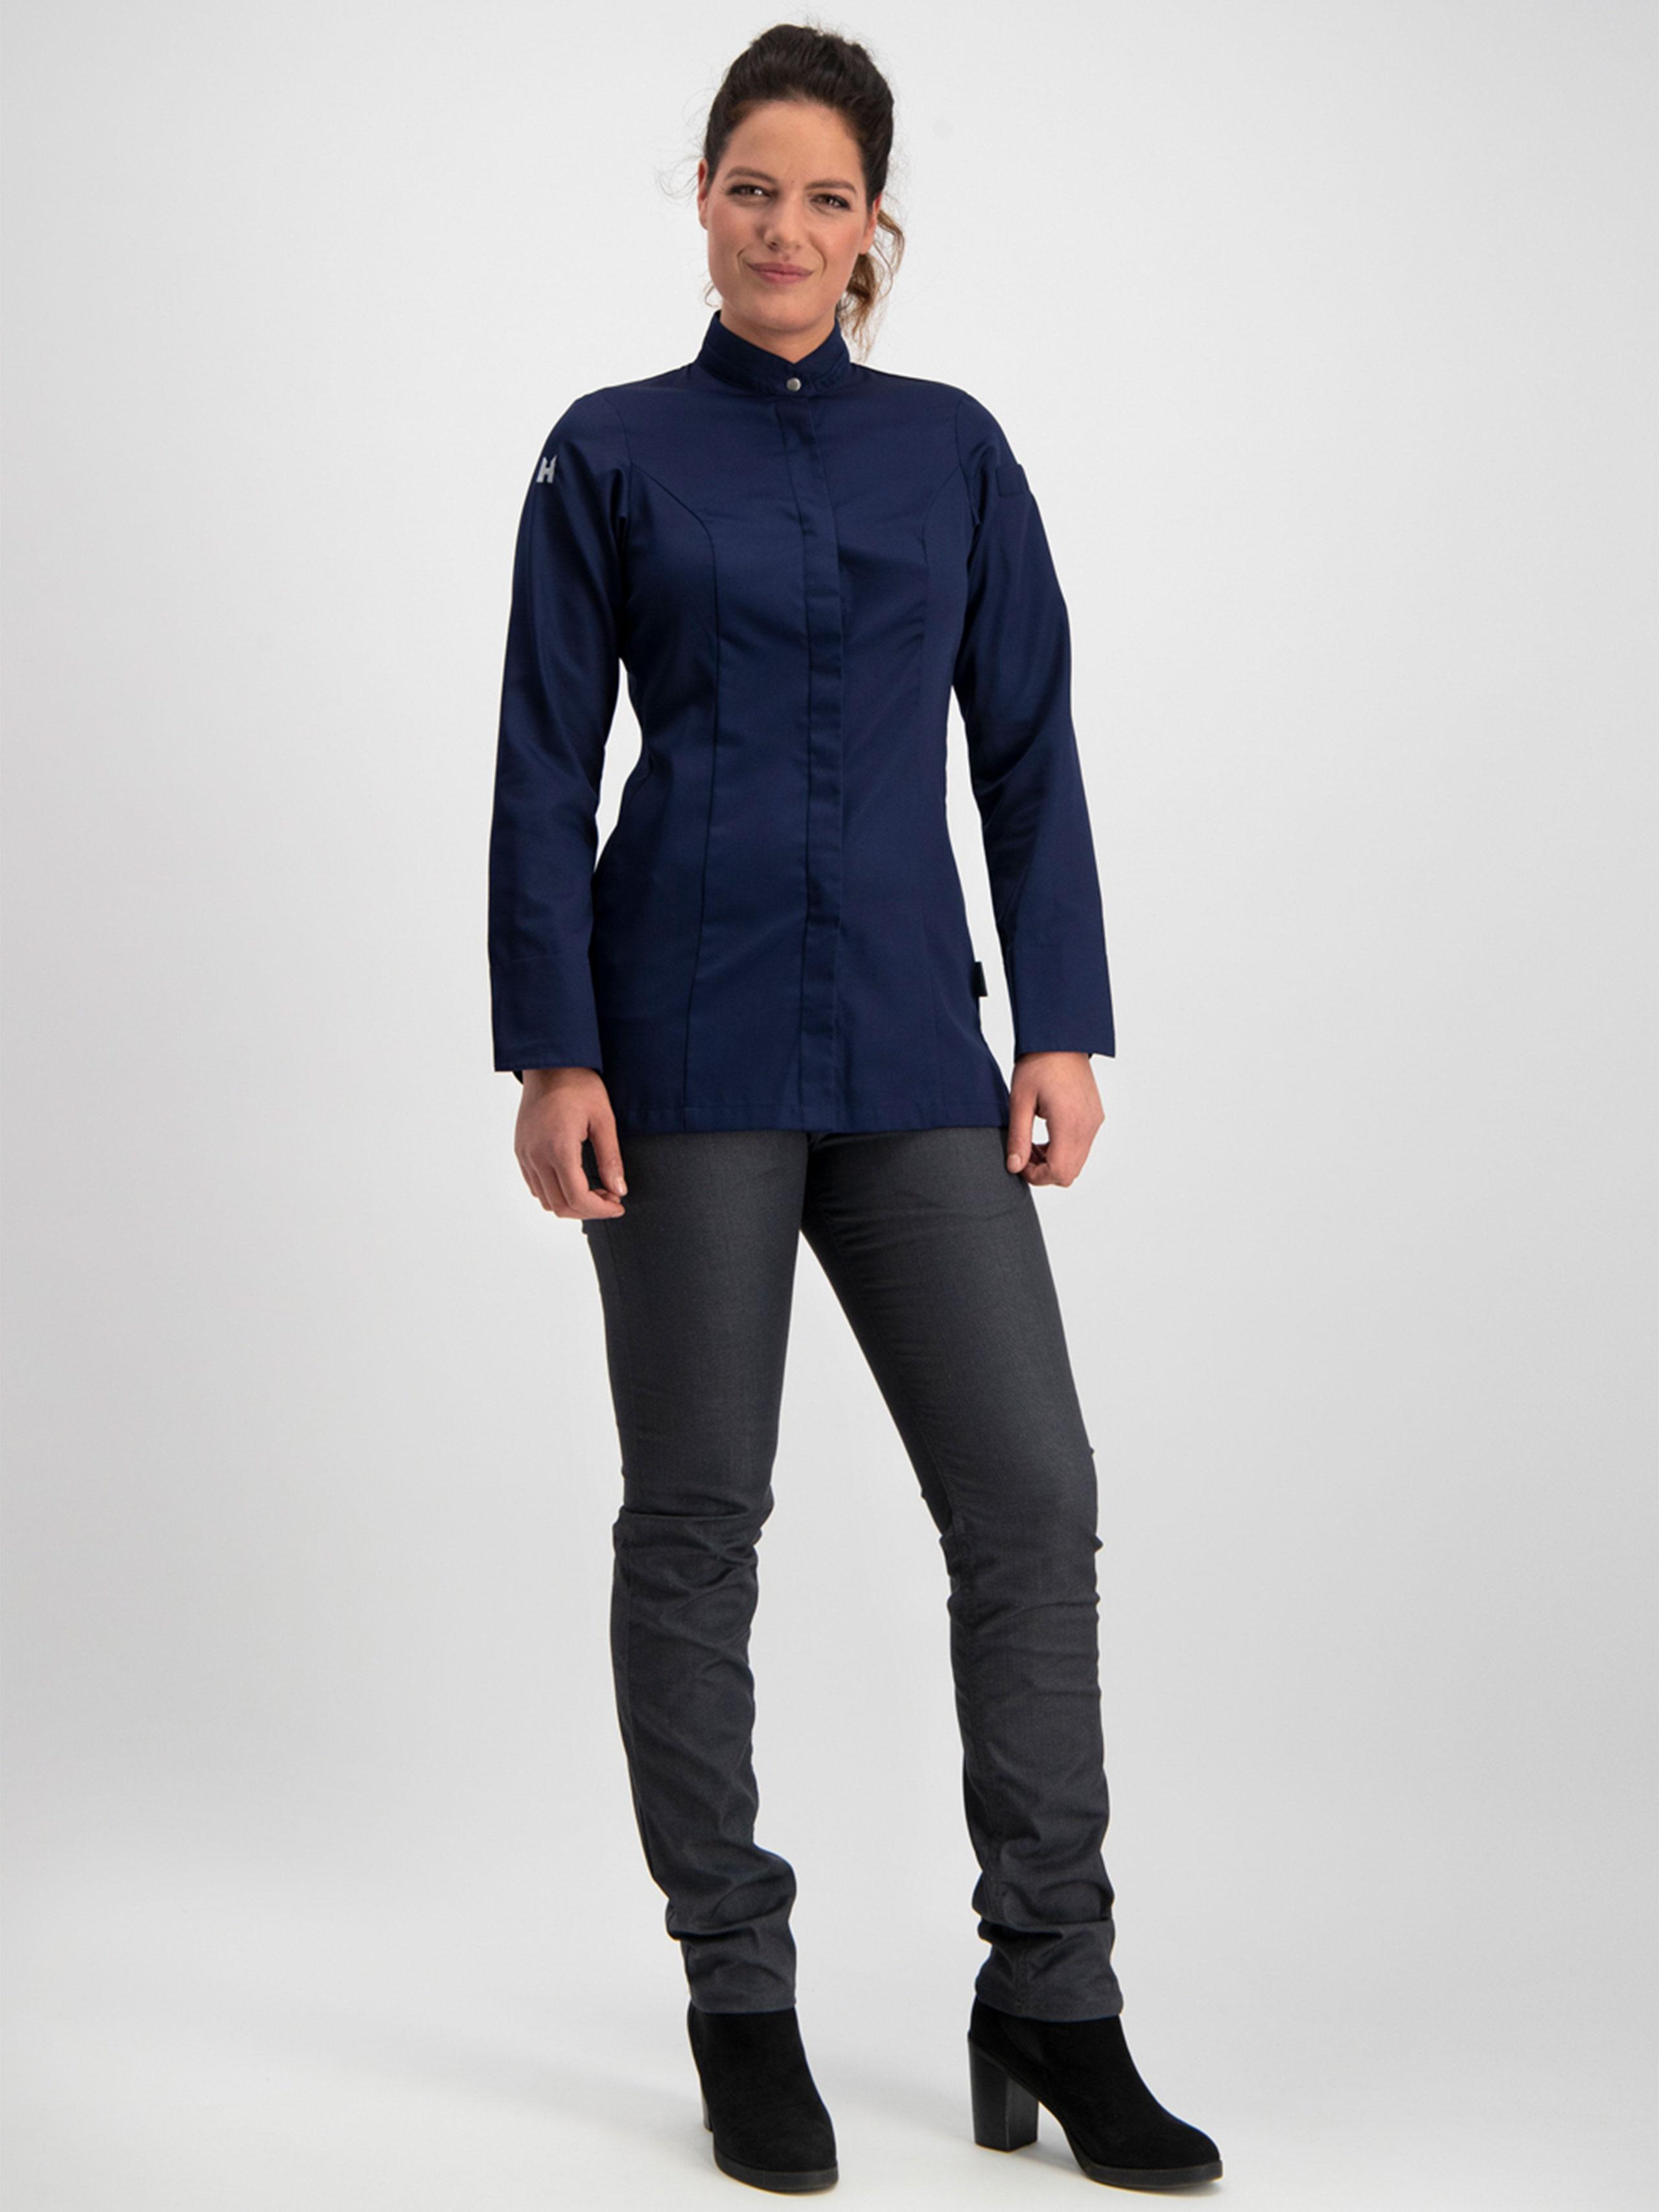 Chef Jacket Venus Patriot Blue